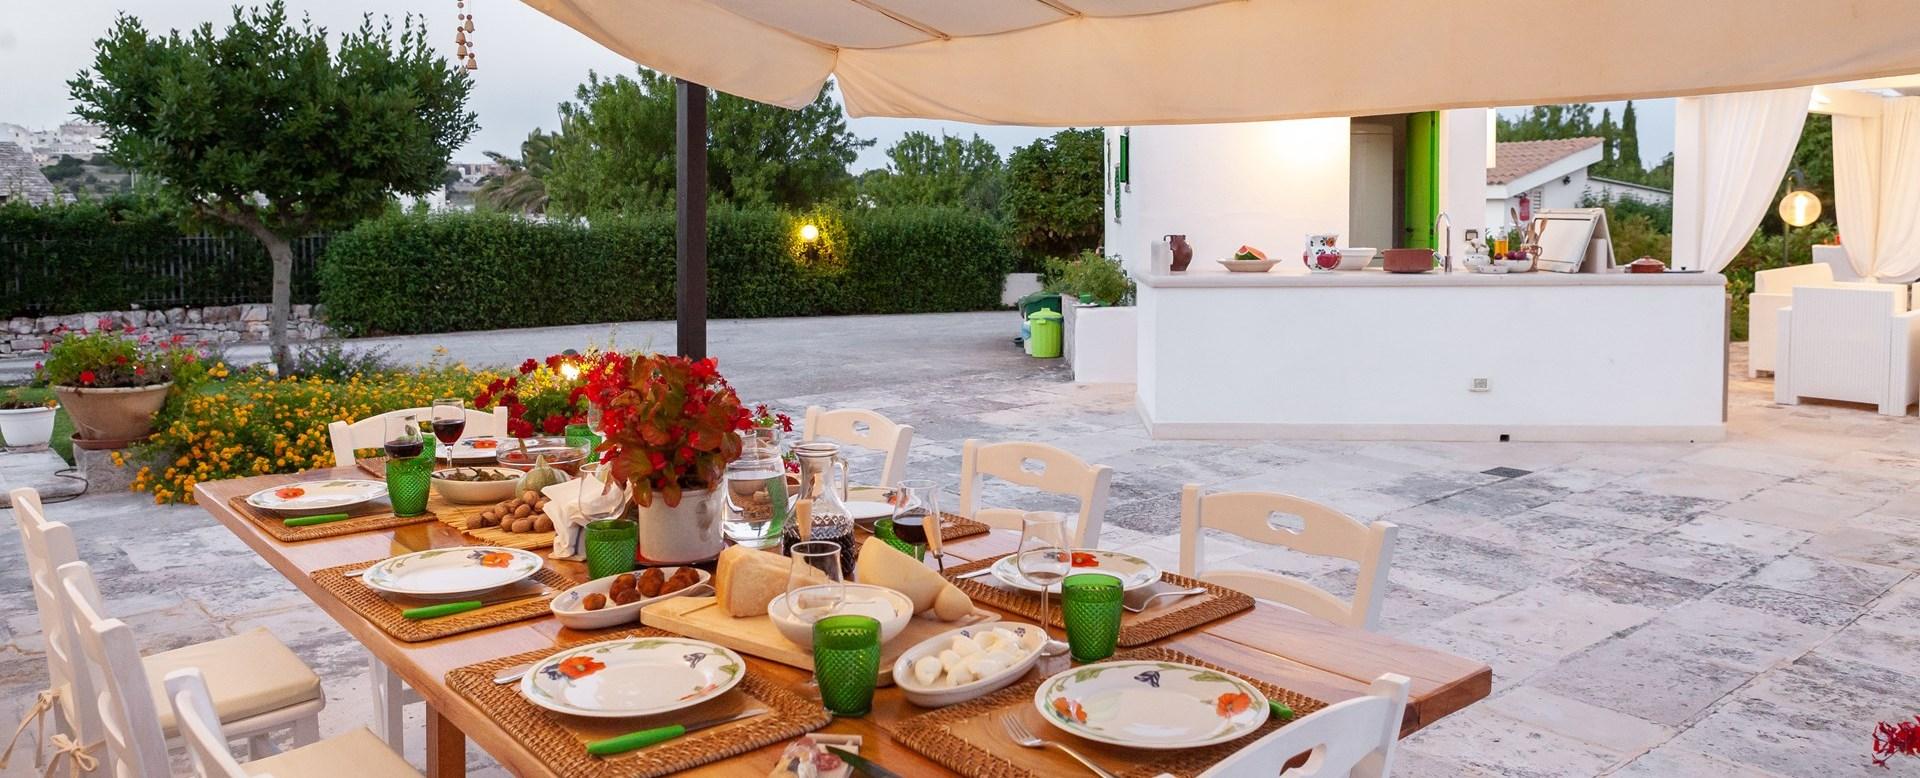 trulli-die-pini-al-fresco-dining